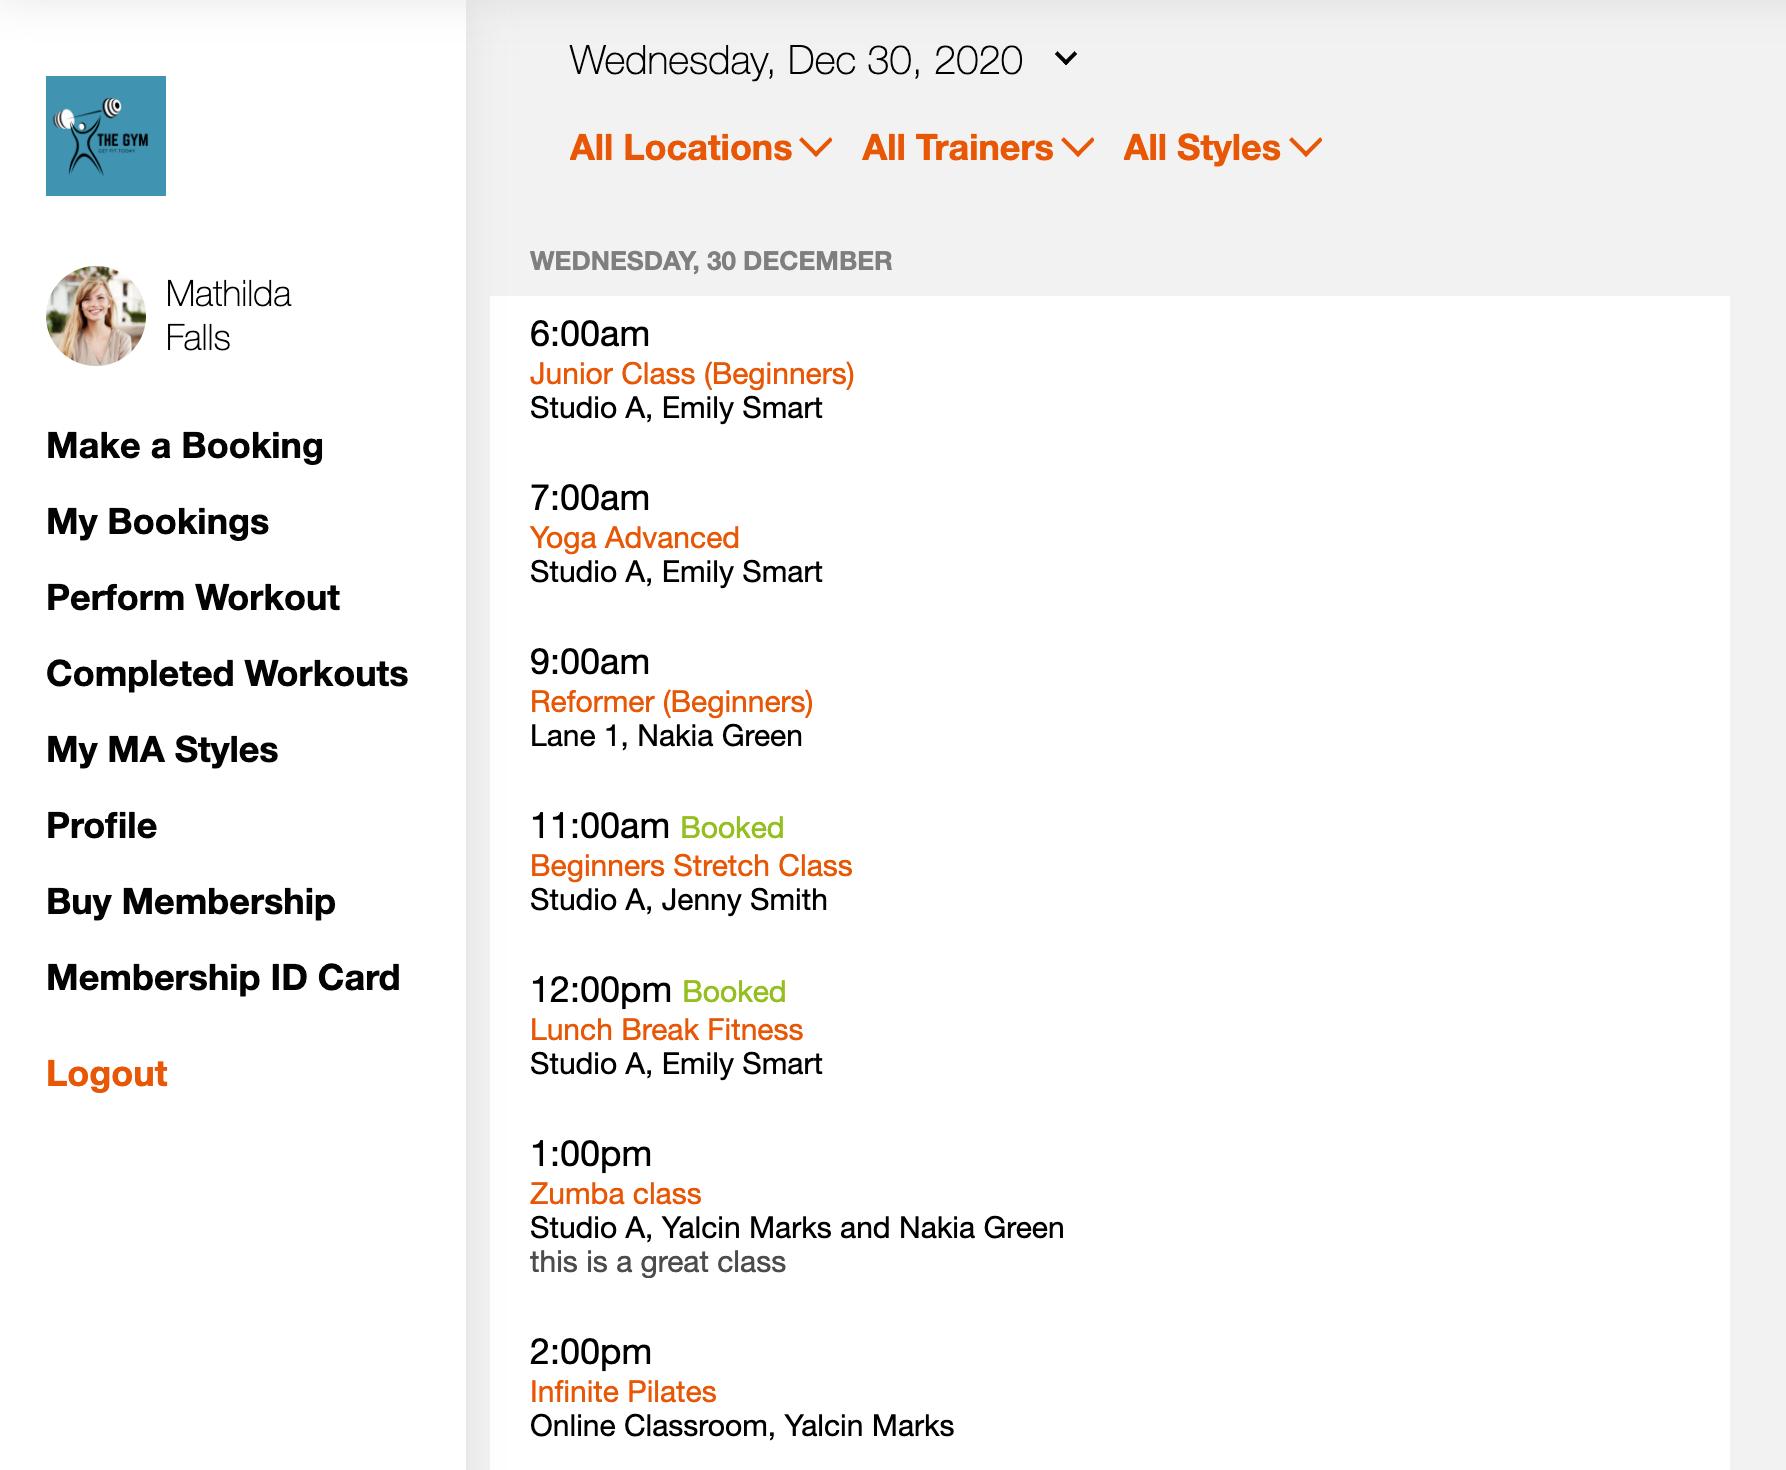 Clubworx Fitness Business Software Dashboard v211